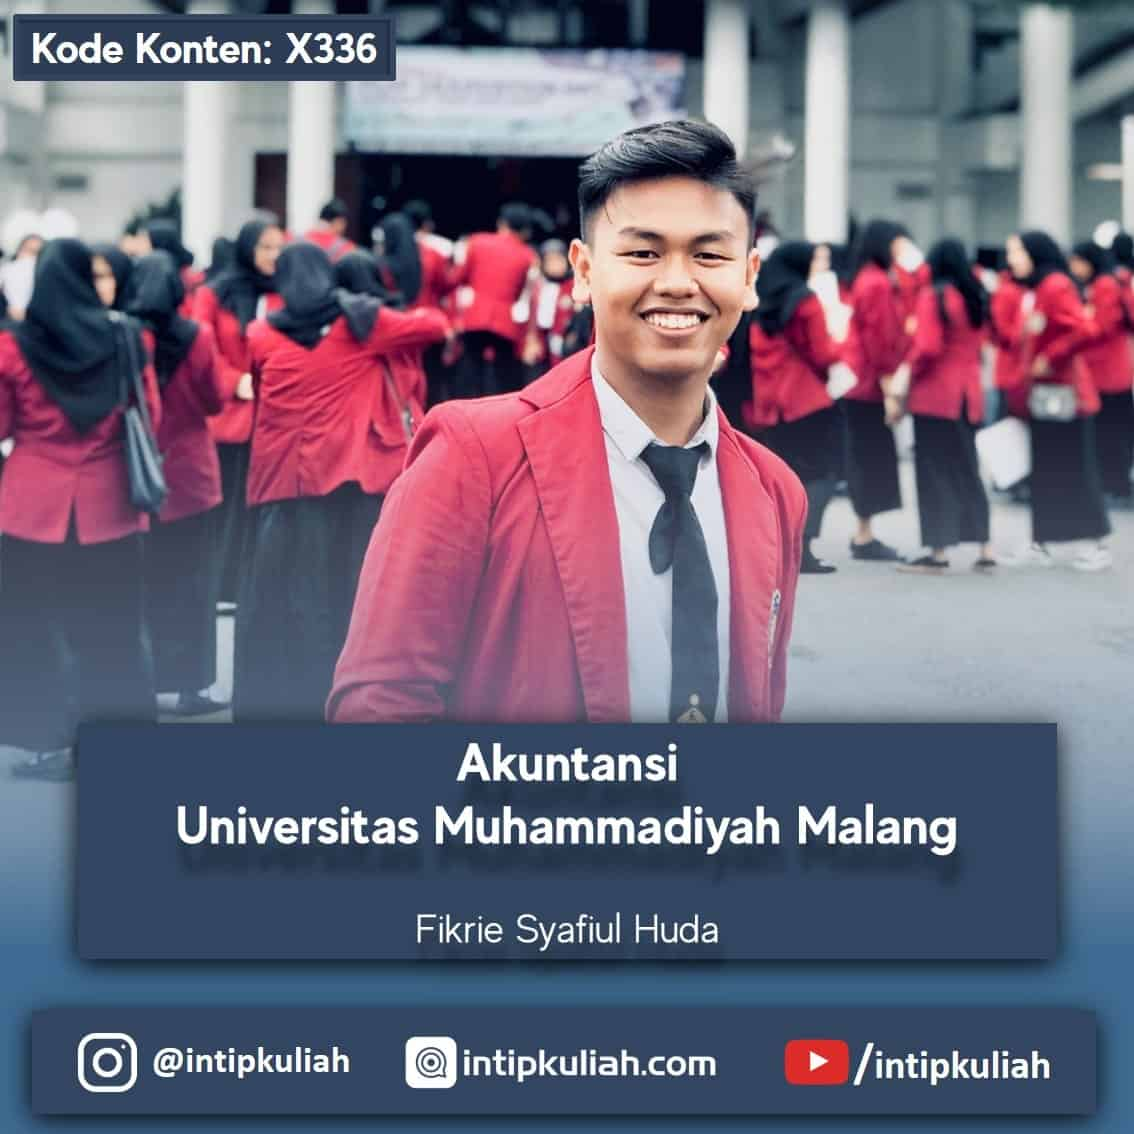 Akuntansi Universitas Muhammadiyah Malang (Fikrie)